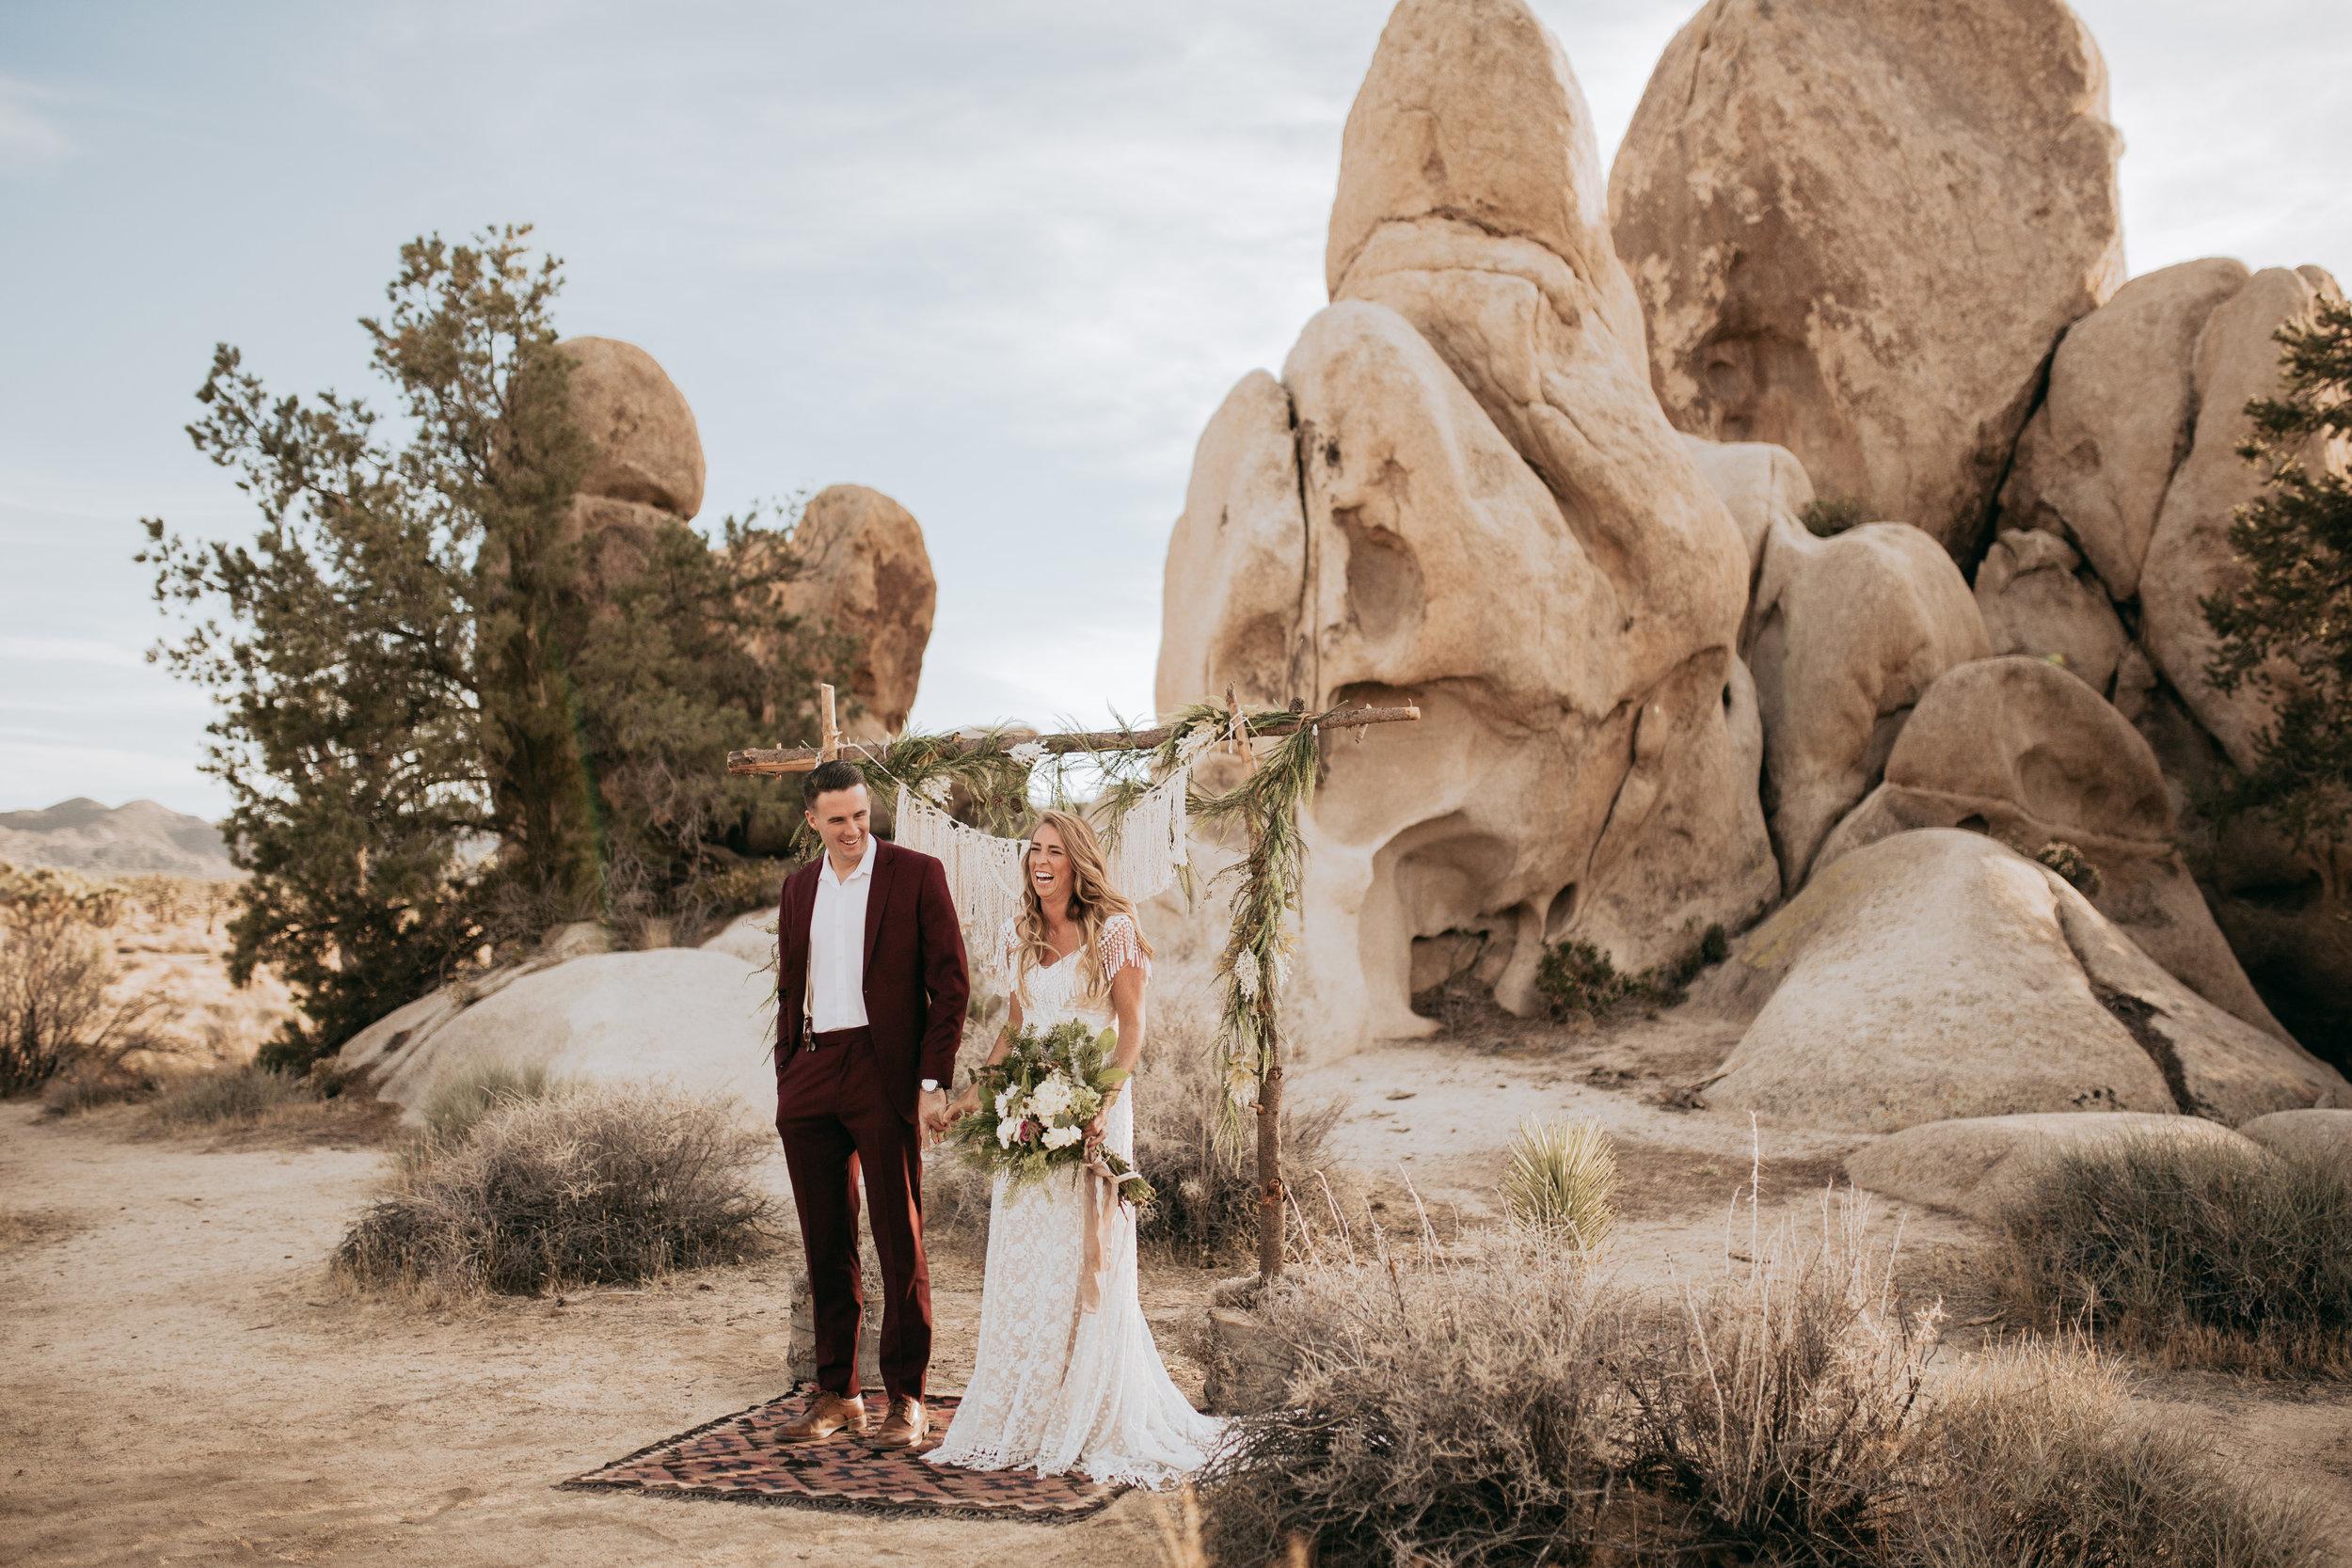 palmsprings_joshuatree_california_wedding_photographer-19.jpg